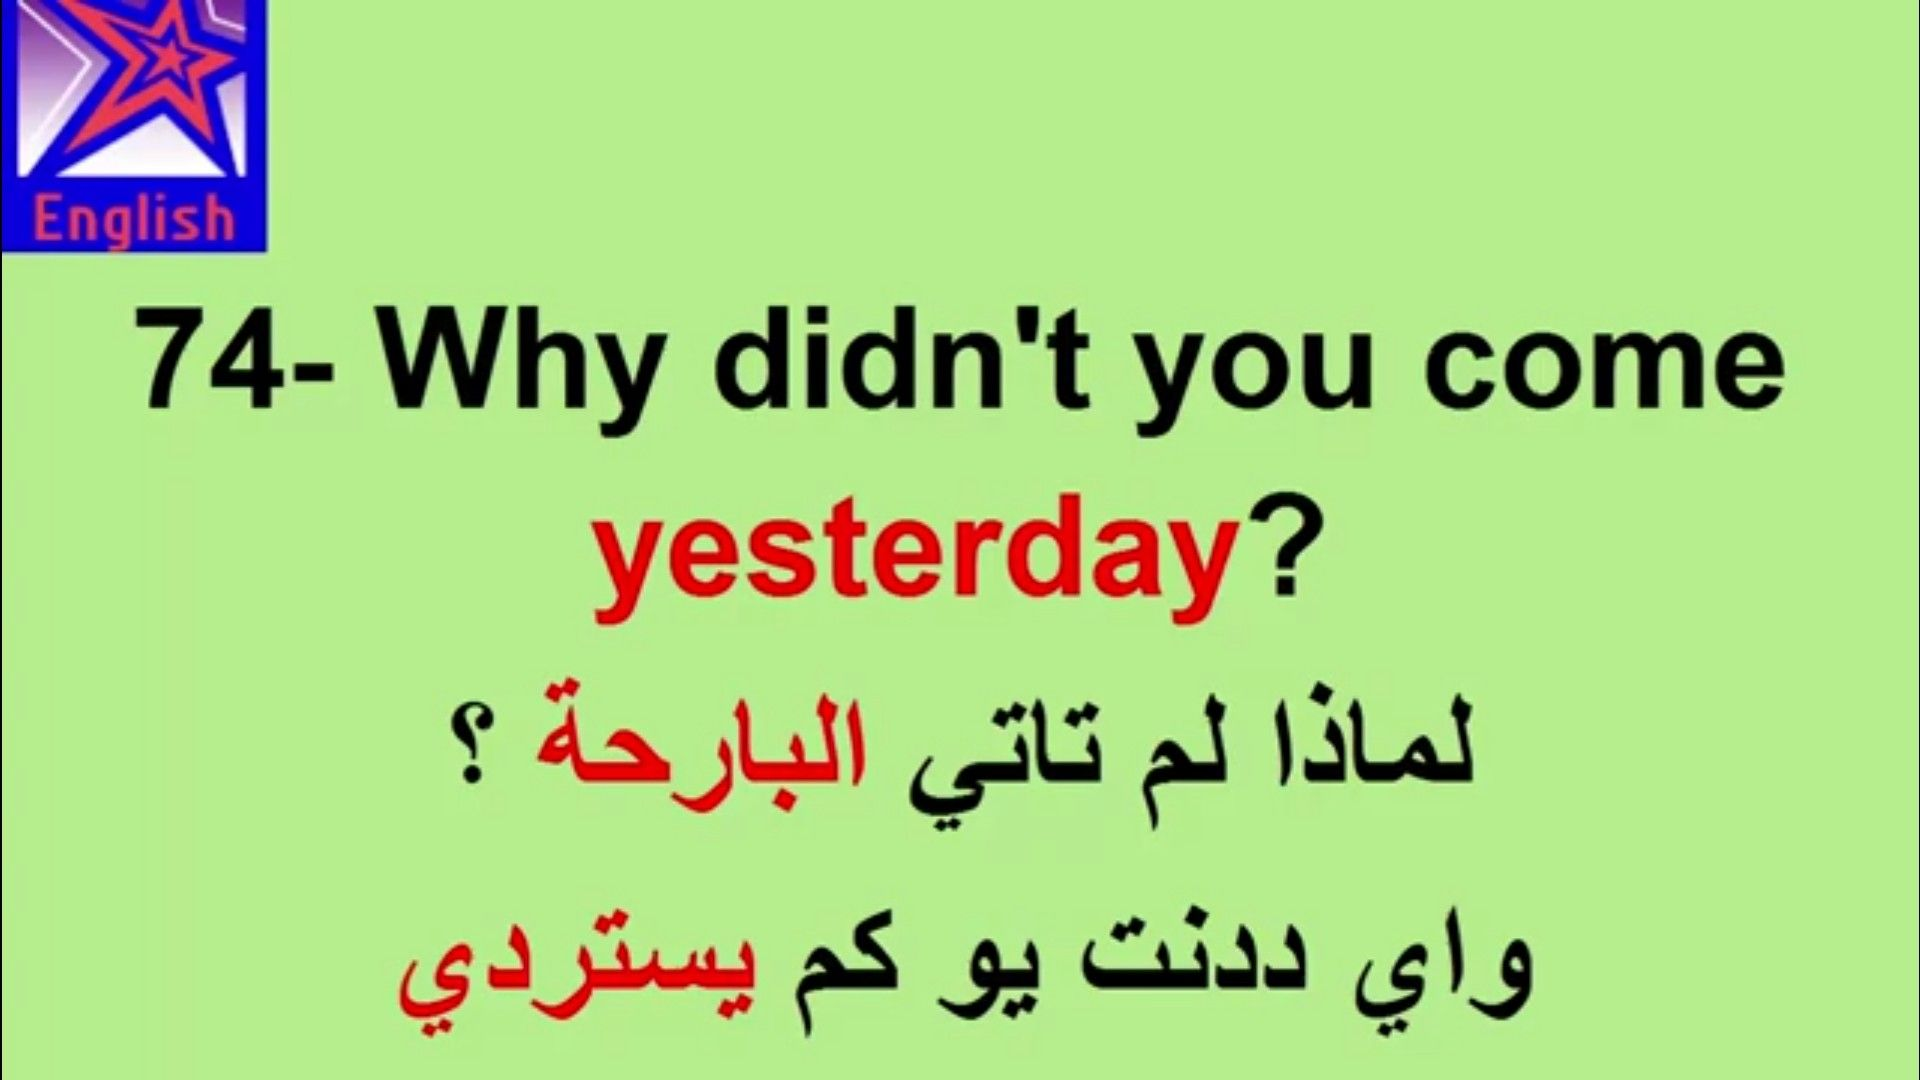 Learning Arabic Msa Fabienne English Words Learn English Vocabulary English Language Learning